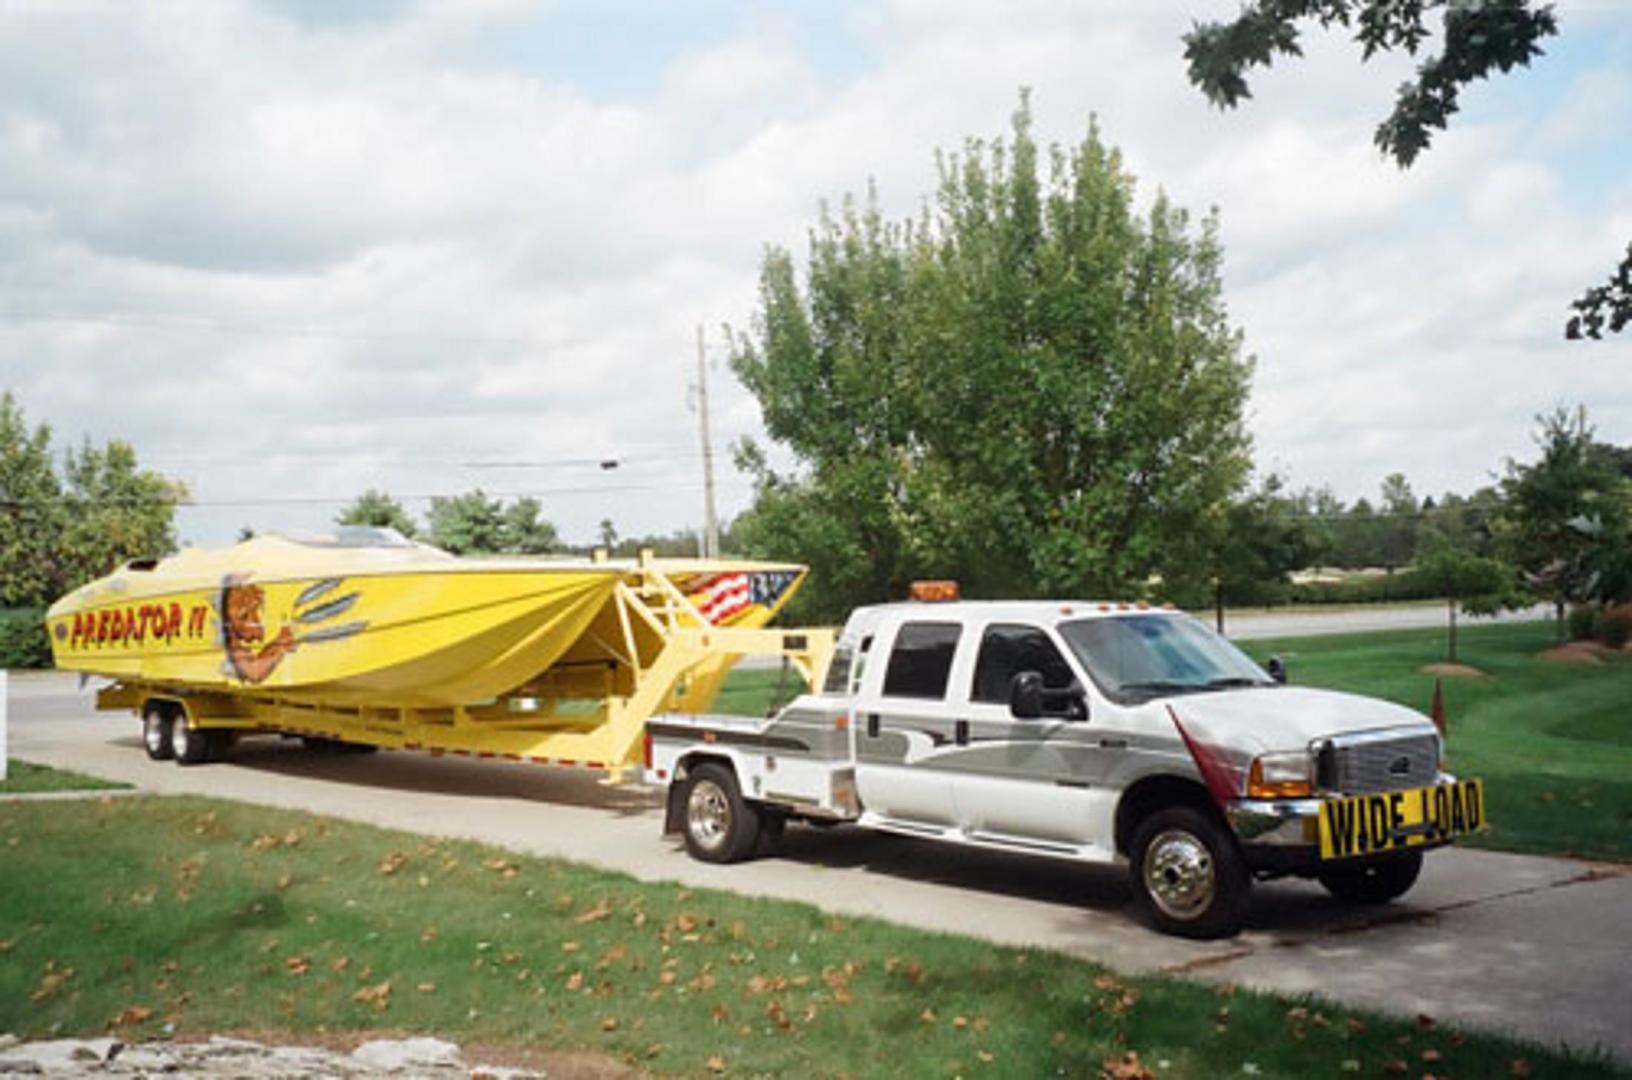 Nor-Tech-5000 Supercat 2002-PREDATOR IV Greenwood-Indiana-United States-300831 | Thumbnail